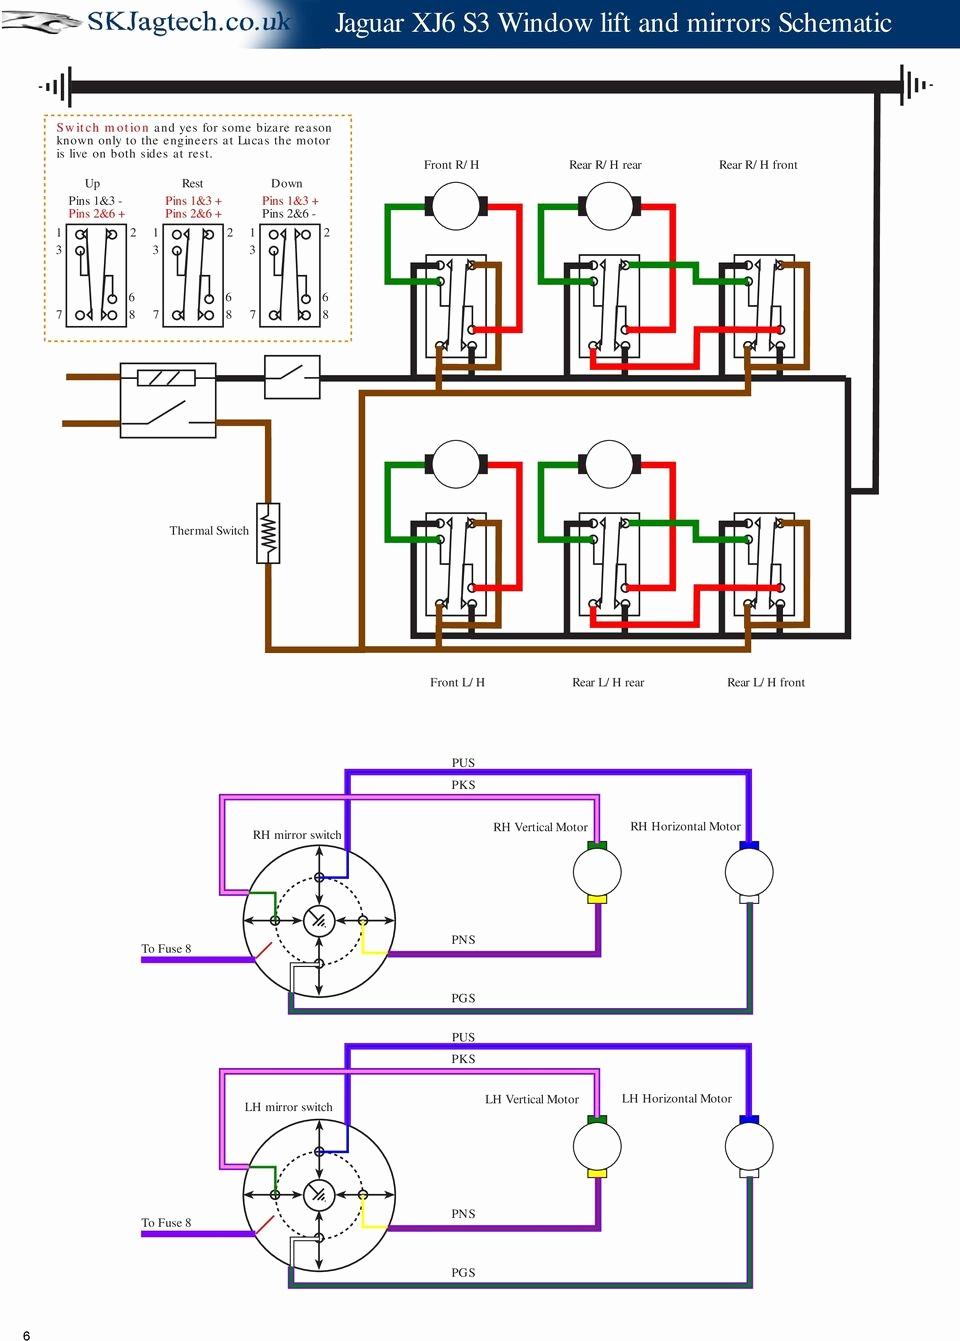 1986 Chevy Power Window Wiring Diagram | Wiring Library - 6 Pin Power Window Switch Wiring Diagram